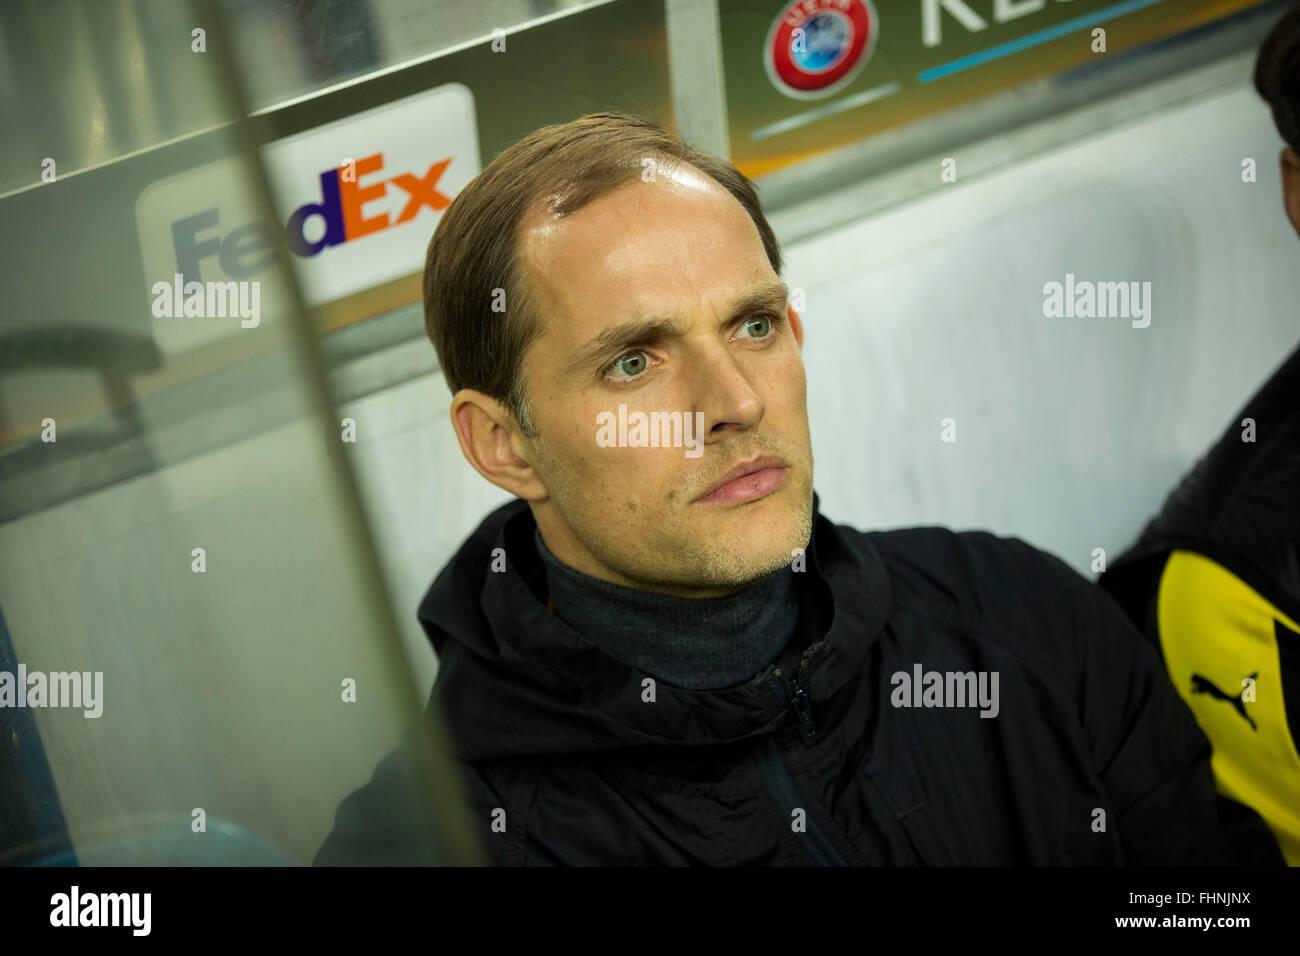 Porto, Portugal. 25th February, 2016. Dortmund's coach Thomas Tuchel during UEFA Europa League  2015/16 round - Stock Image